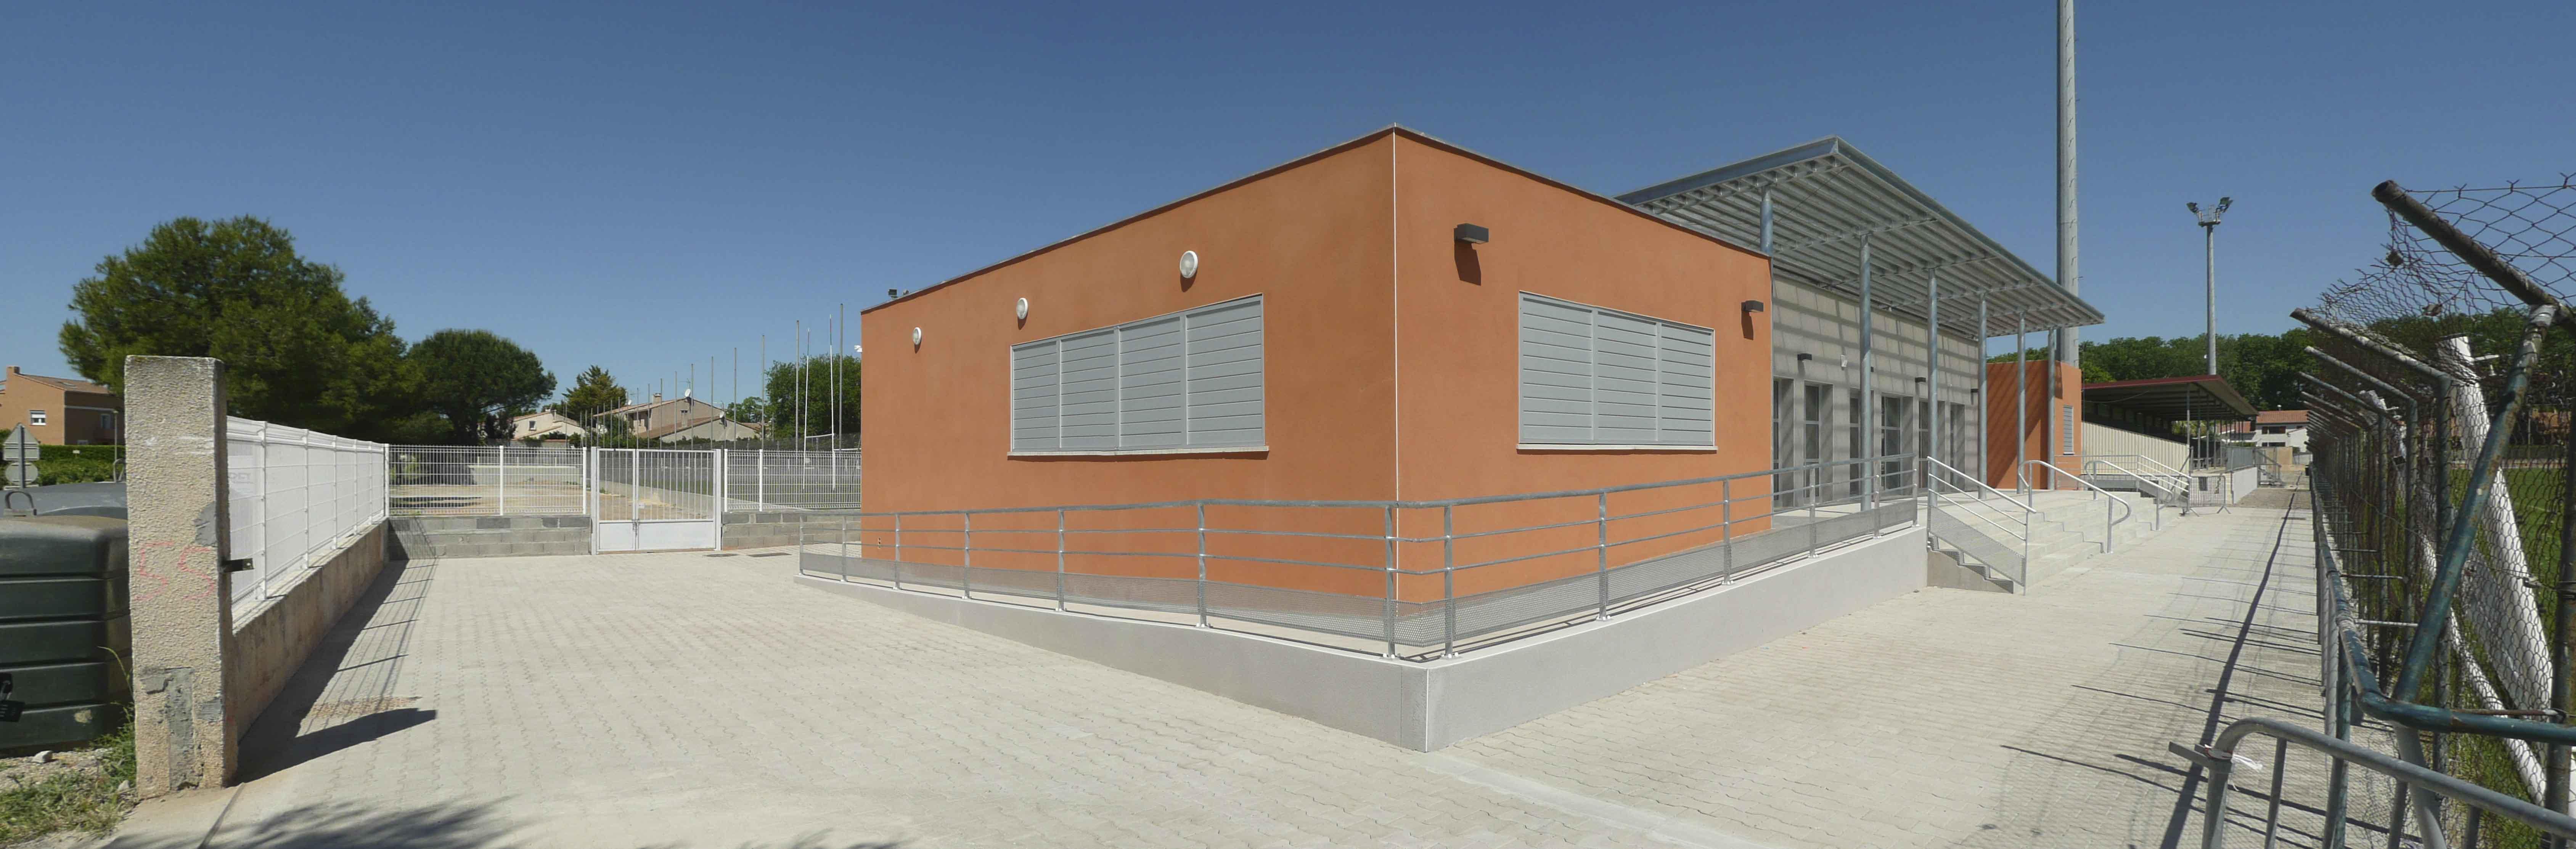 Club House salle polyvalente Hérault BF architecture 3